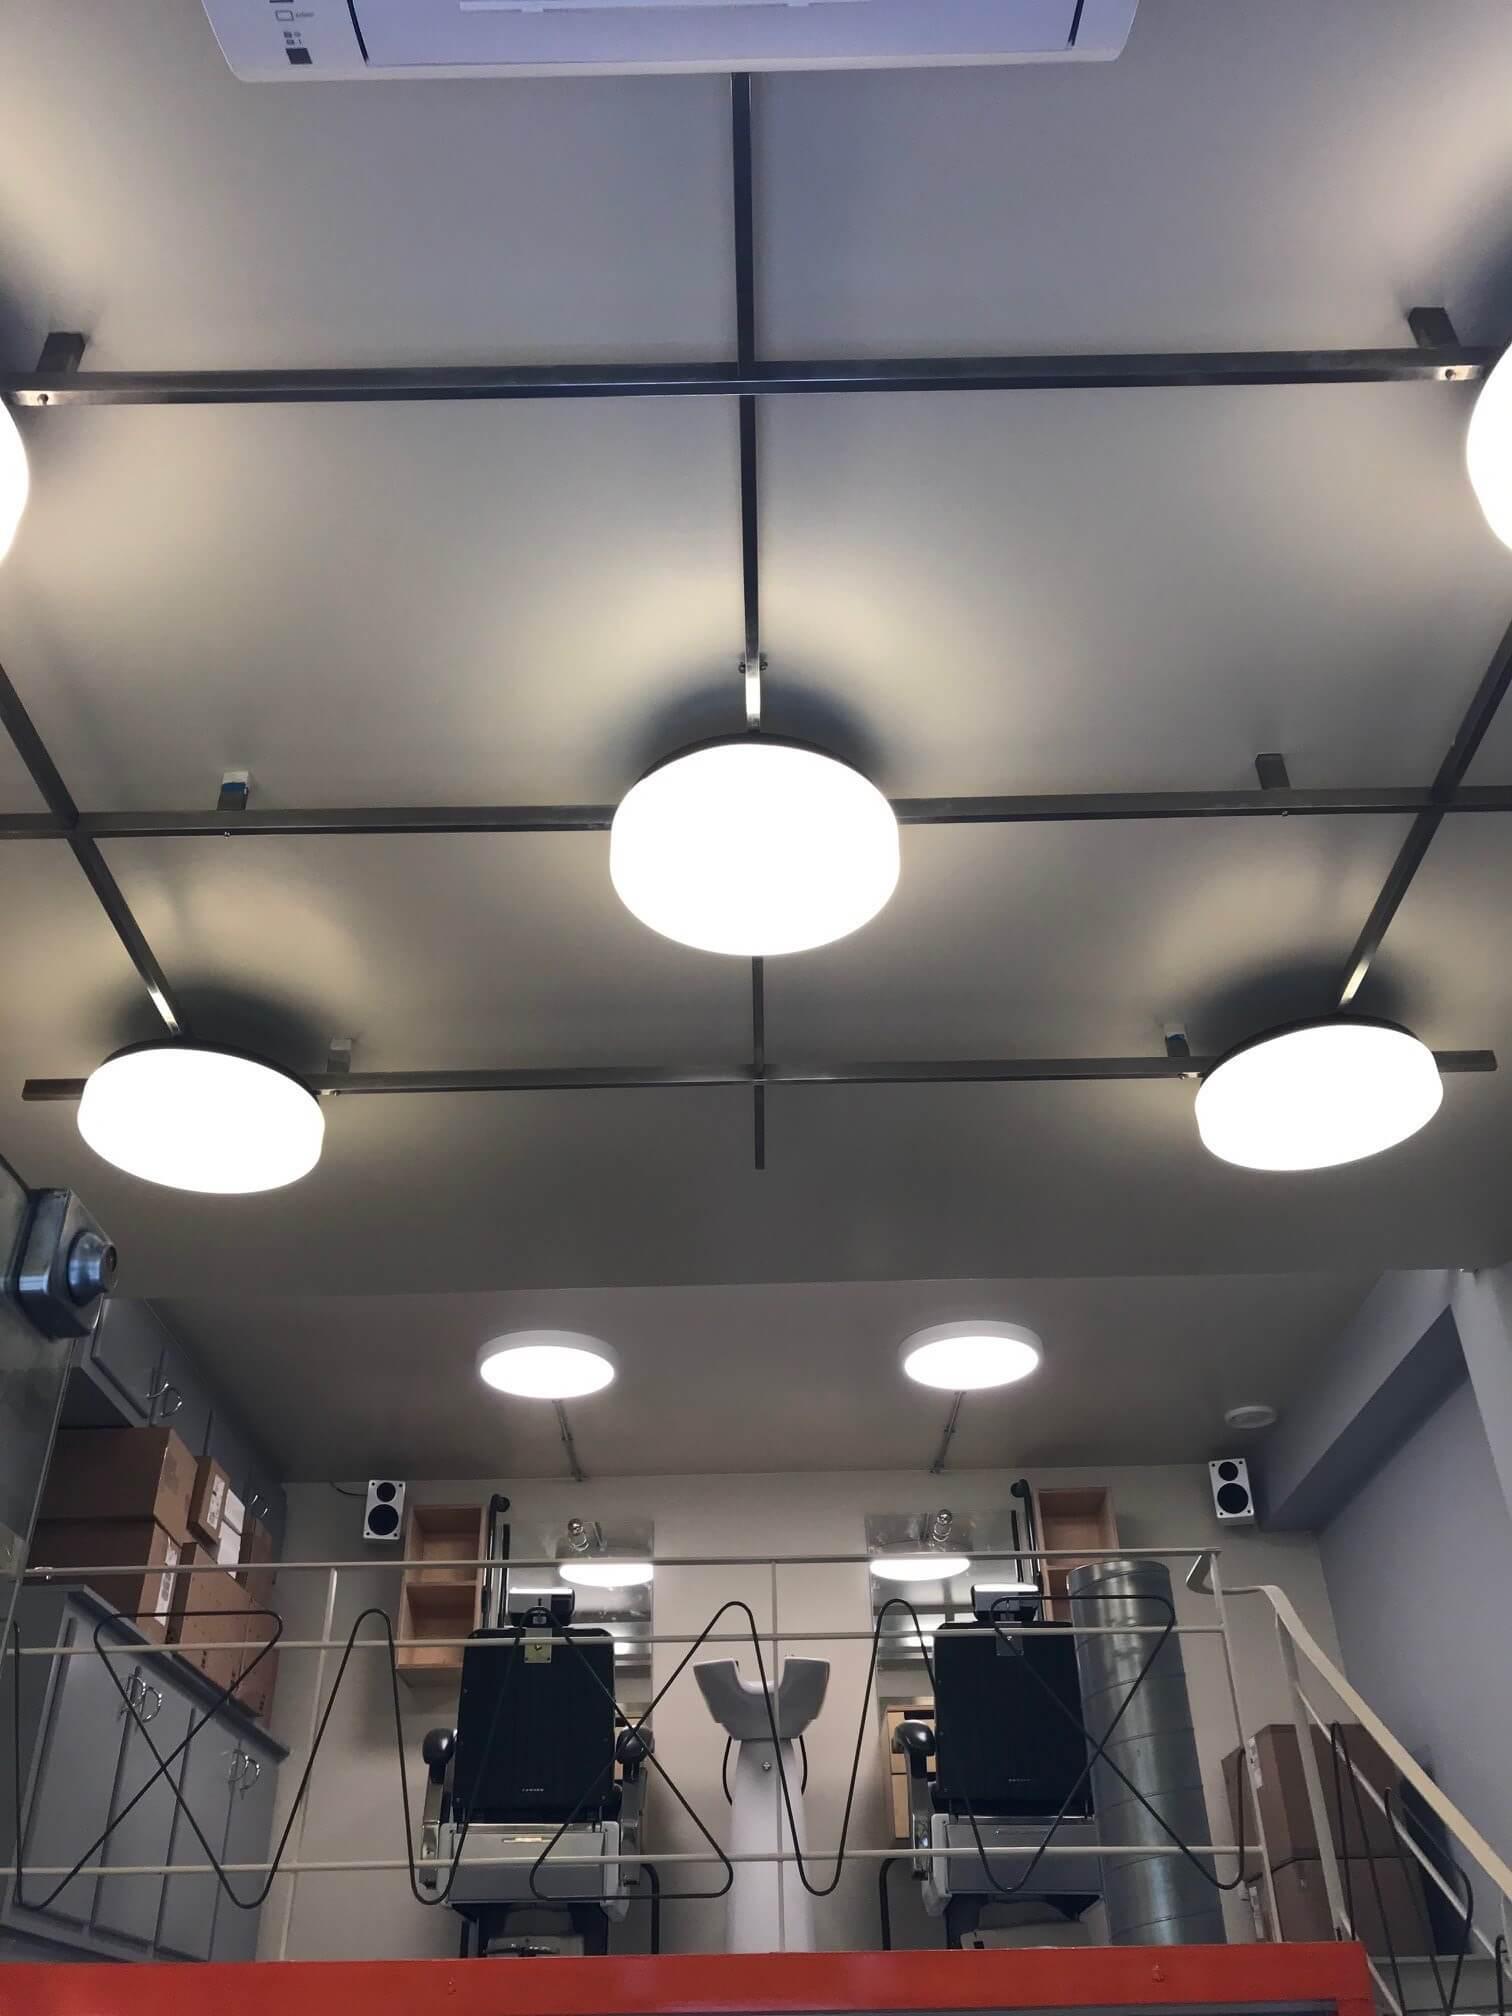 barbershop-elec-galerie-electricite-vanhoyesprl